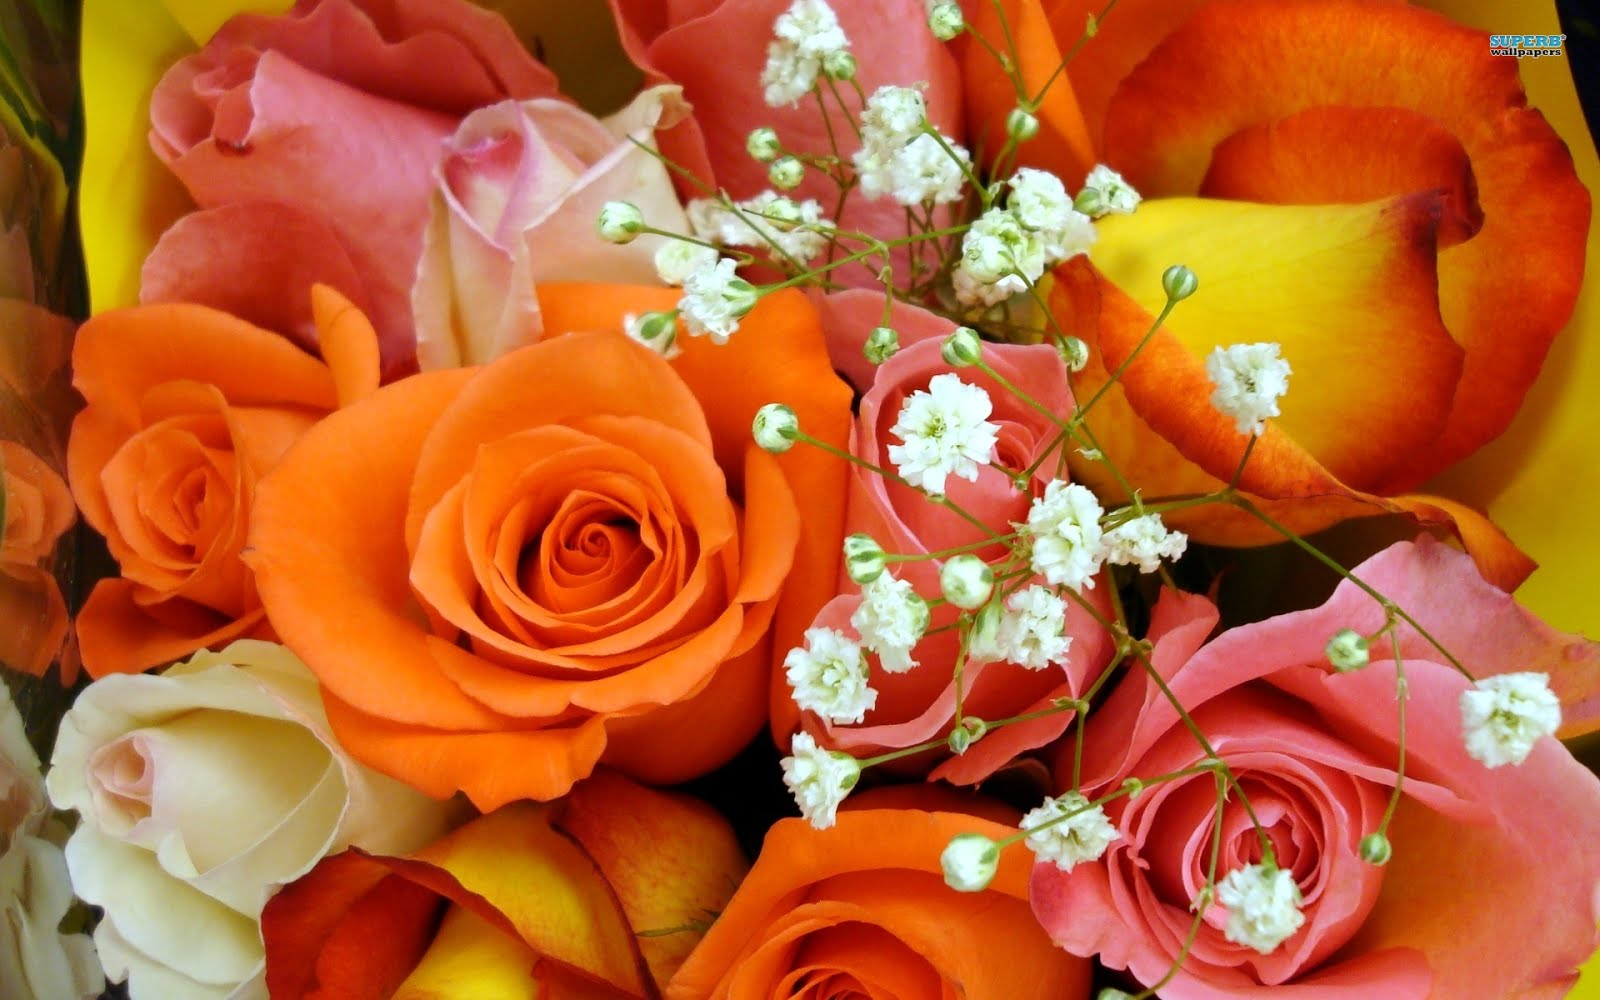 http://2.bp.blogspot.com/-uOX7jld_g_s/UNAsVijdrdI/AAAAAAABBPc/7OCaayWMpBU/s1600/bm-image-717425.jpeg